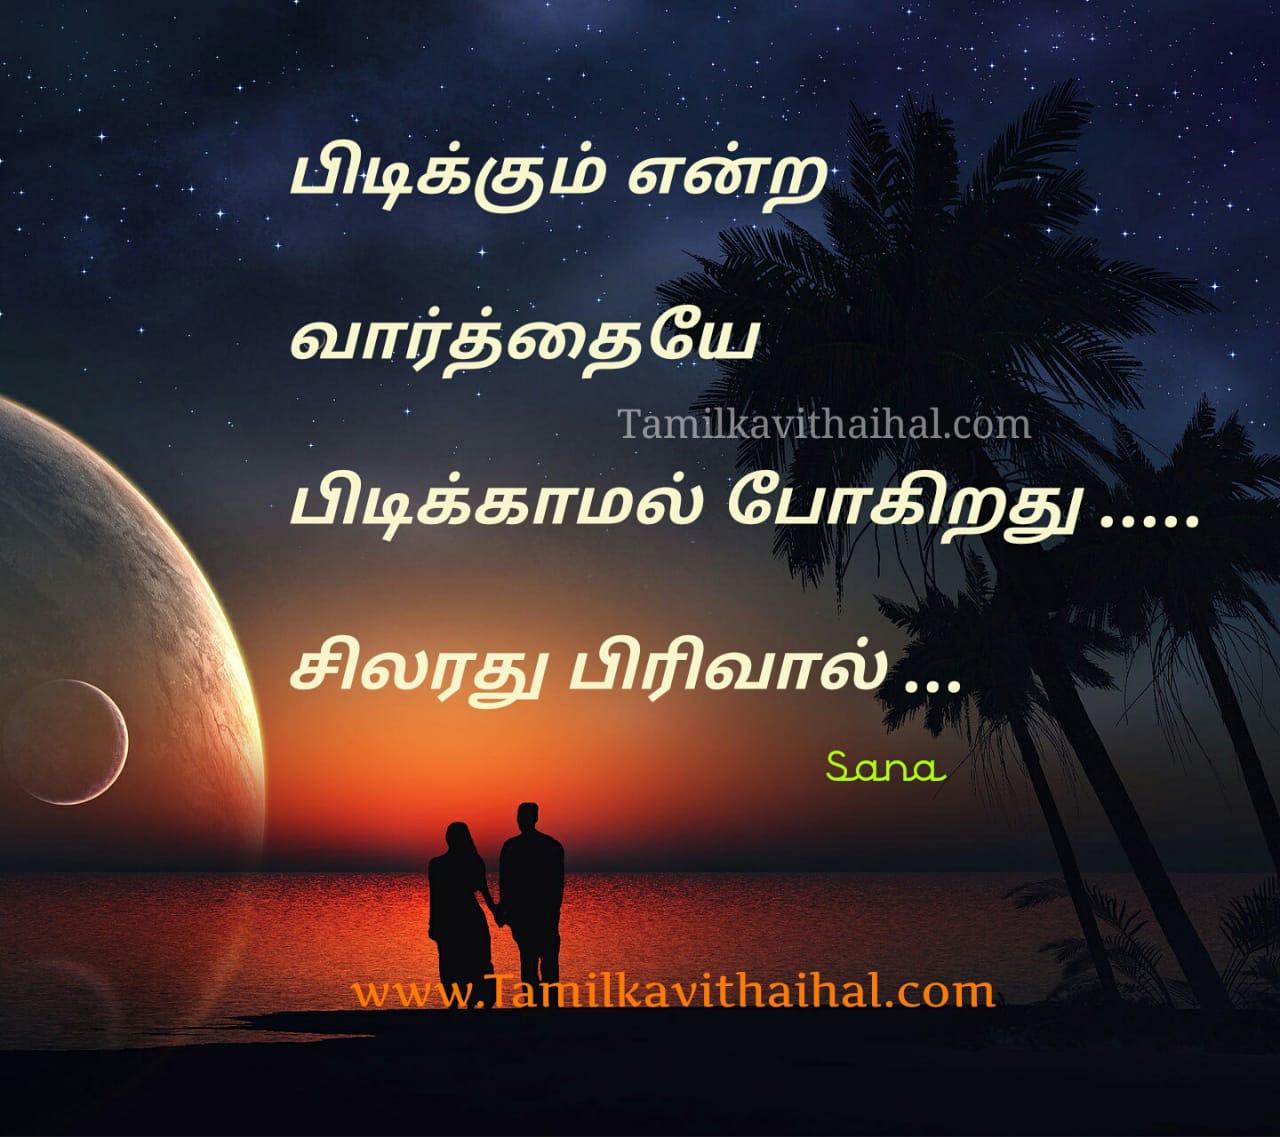 pirivukavithai kadhalkavithai pidikkum unnai misunderstanding kanner tamil images